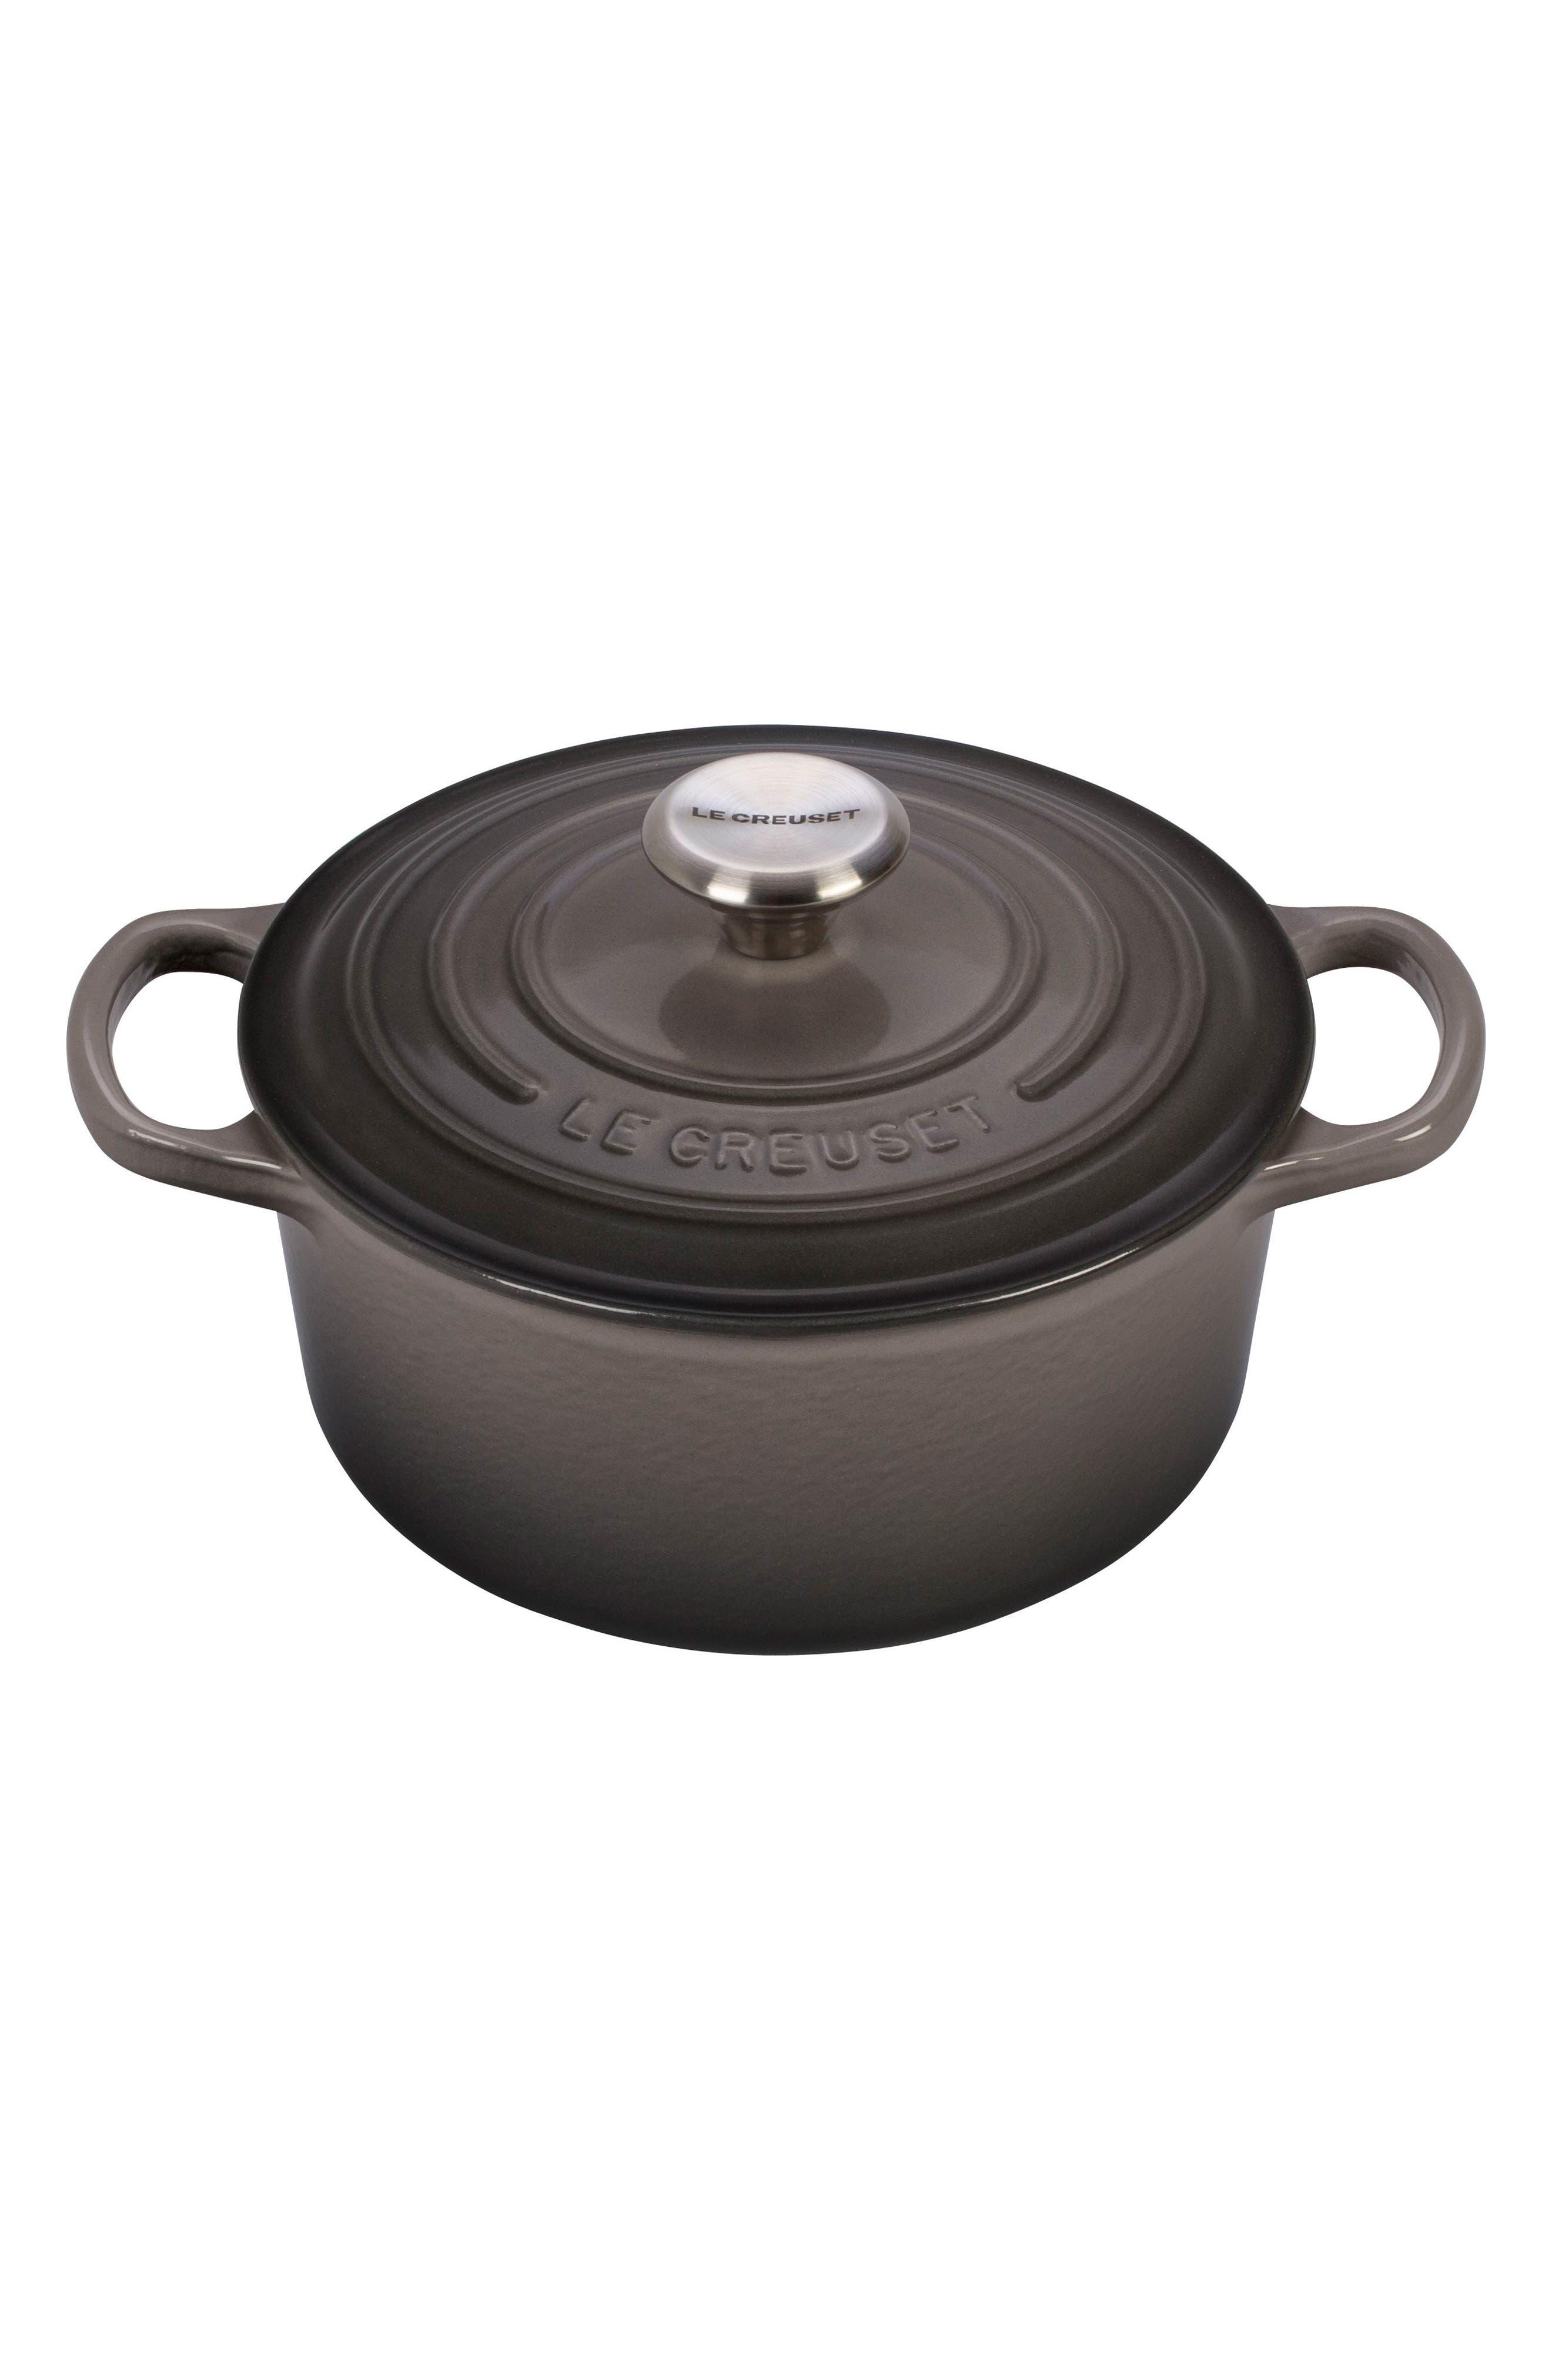 Signature 2-Quart Oval Enamel Cast Iron French/Dutch Oven,                             Main thumbnail 1, color,                             020